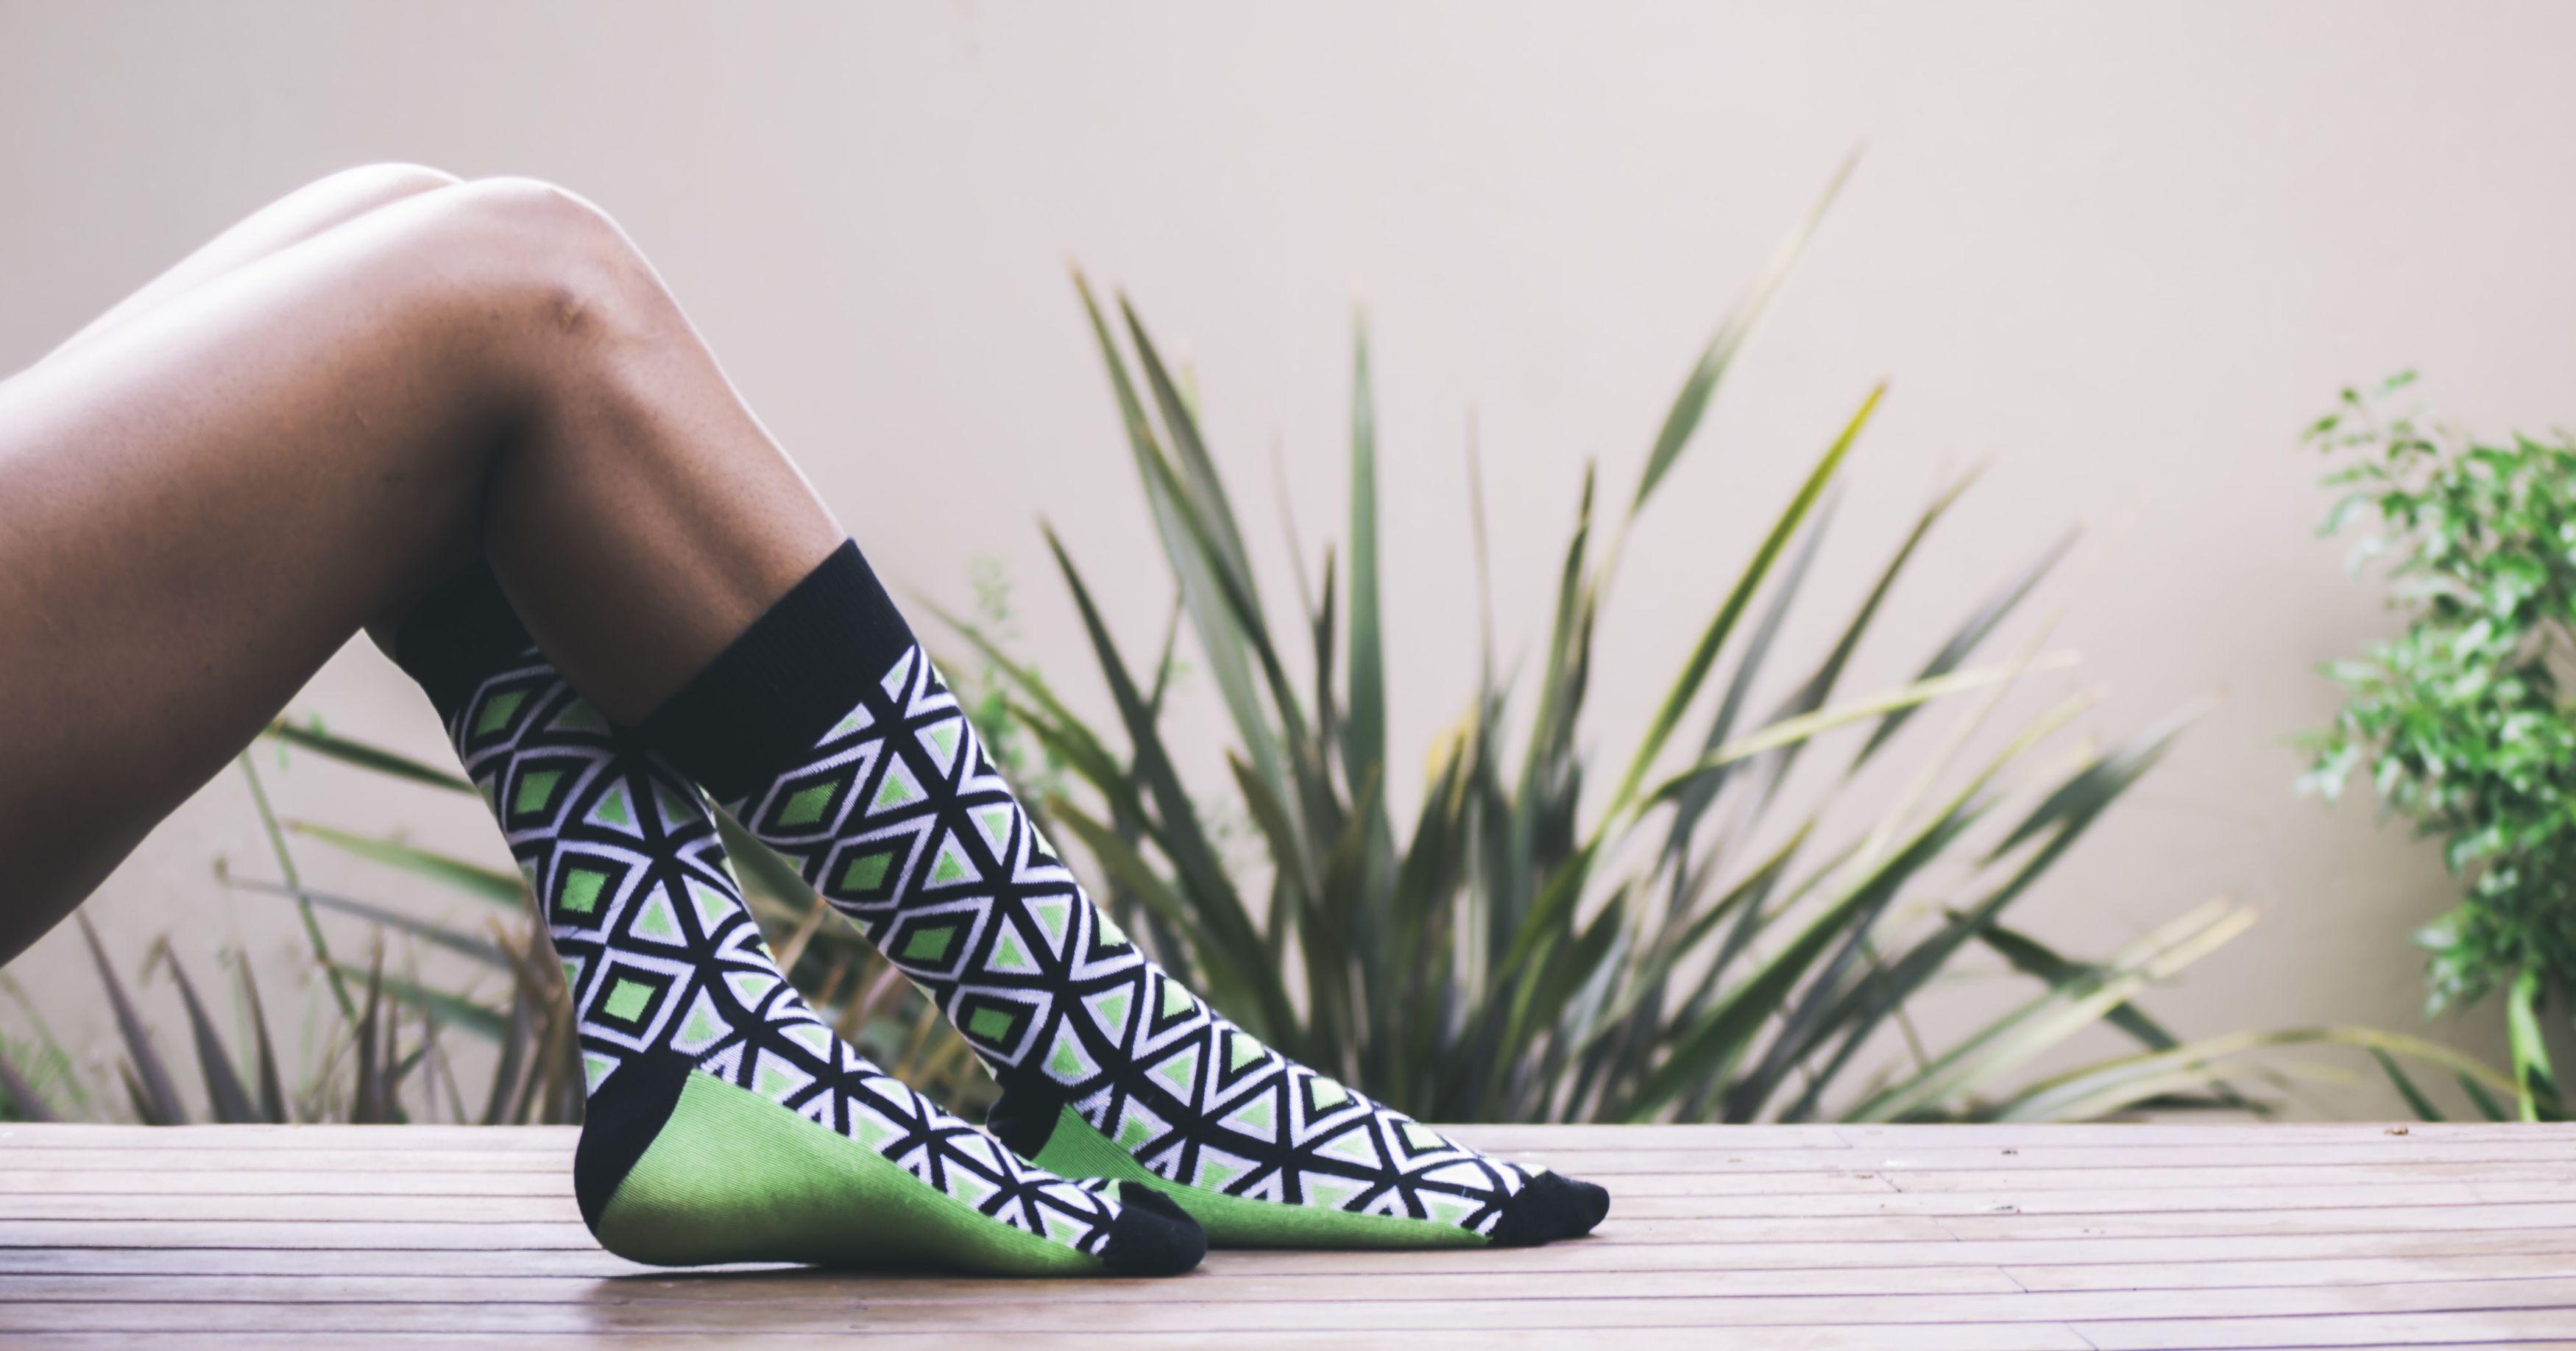 dd-moonlook-african-socks-0330